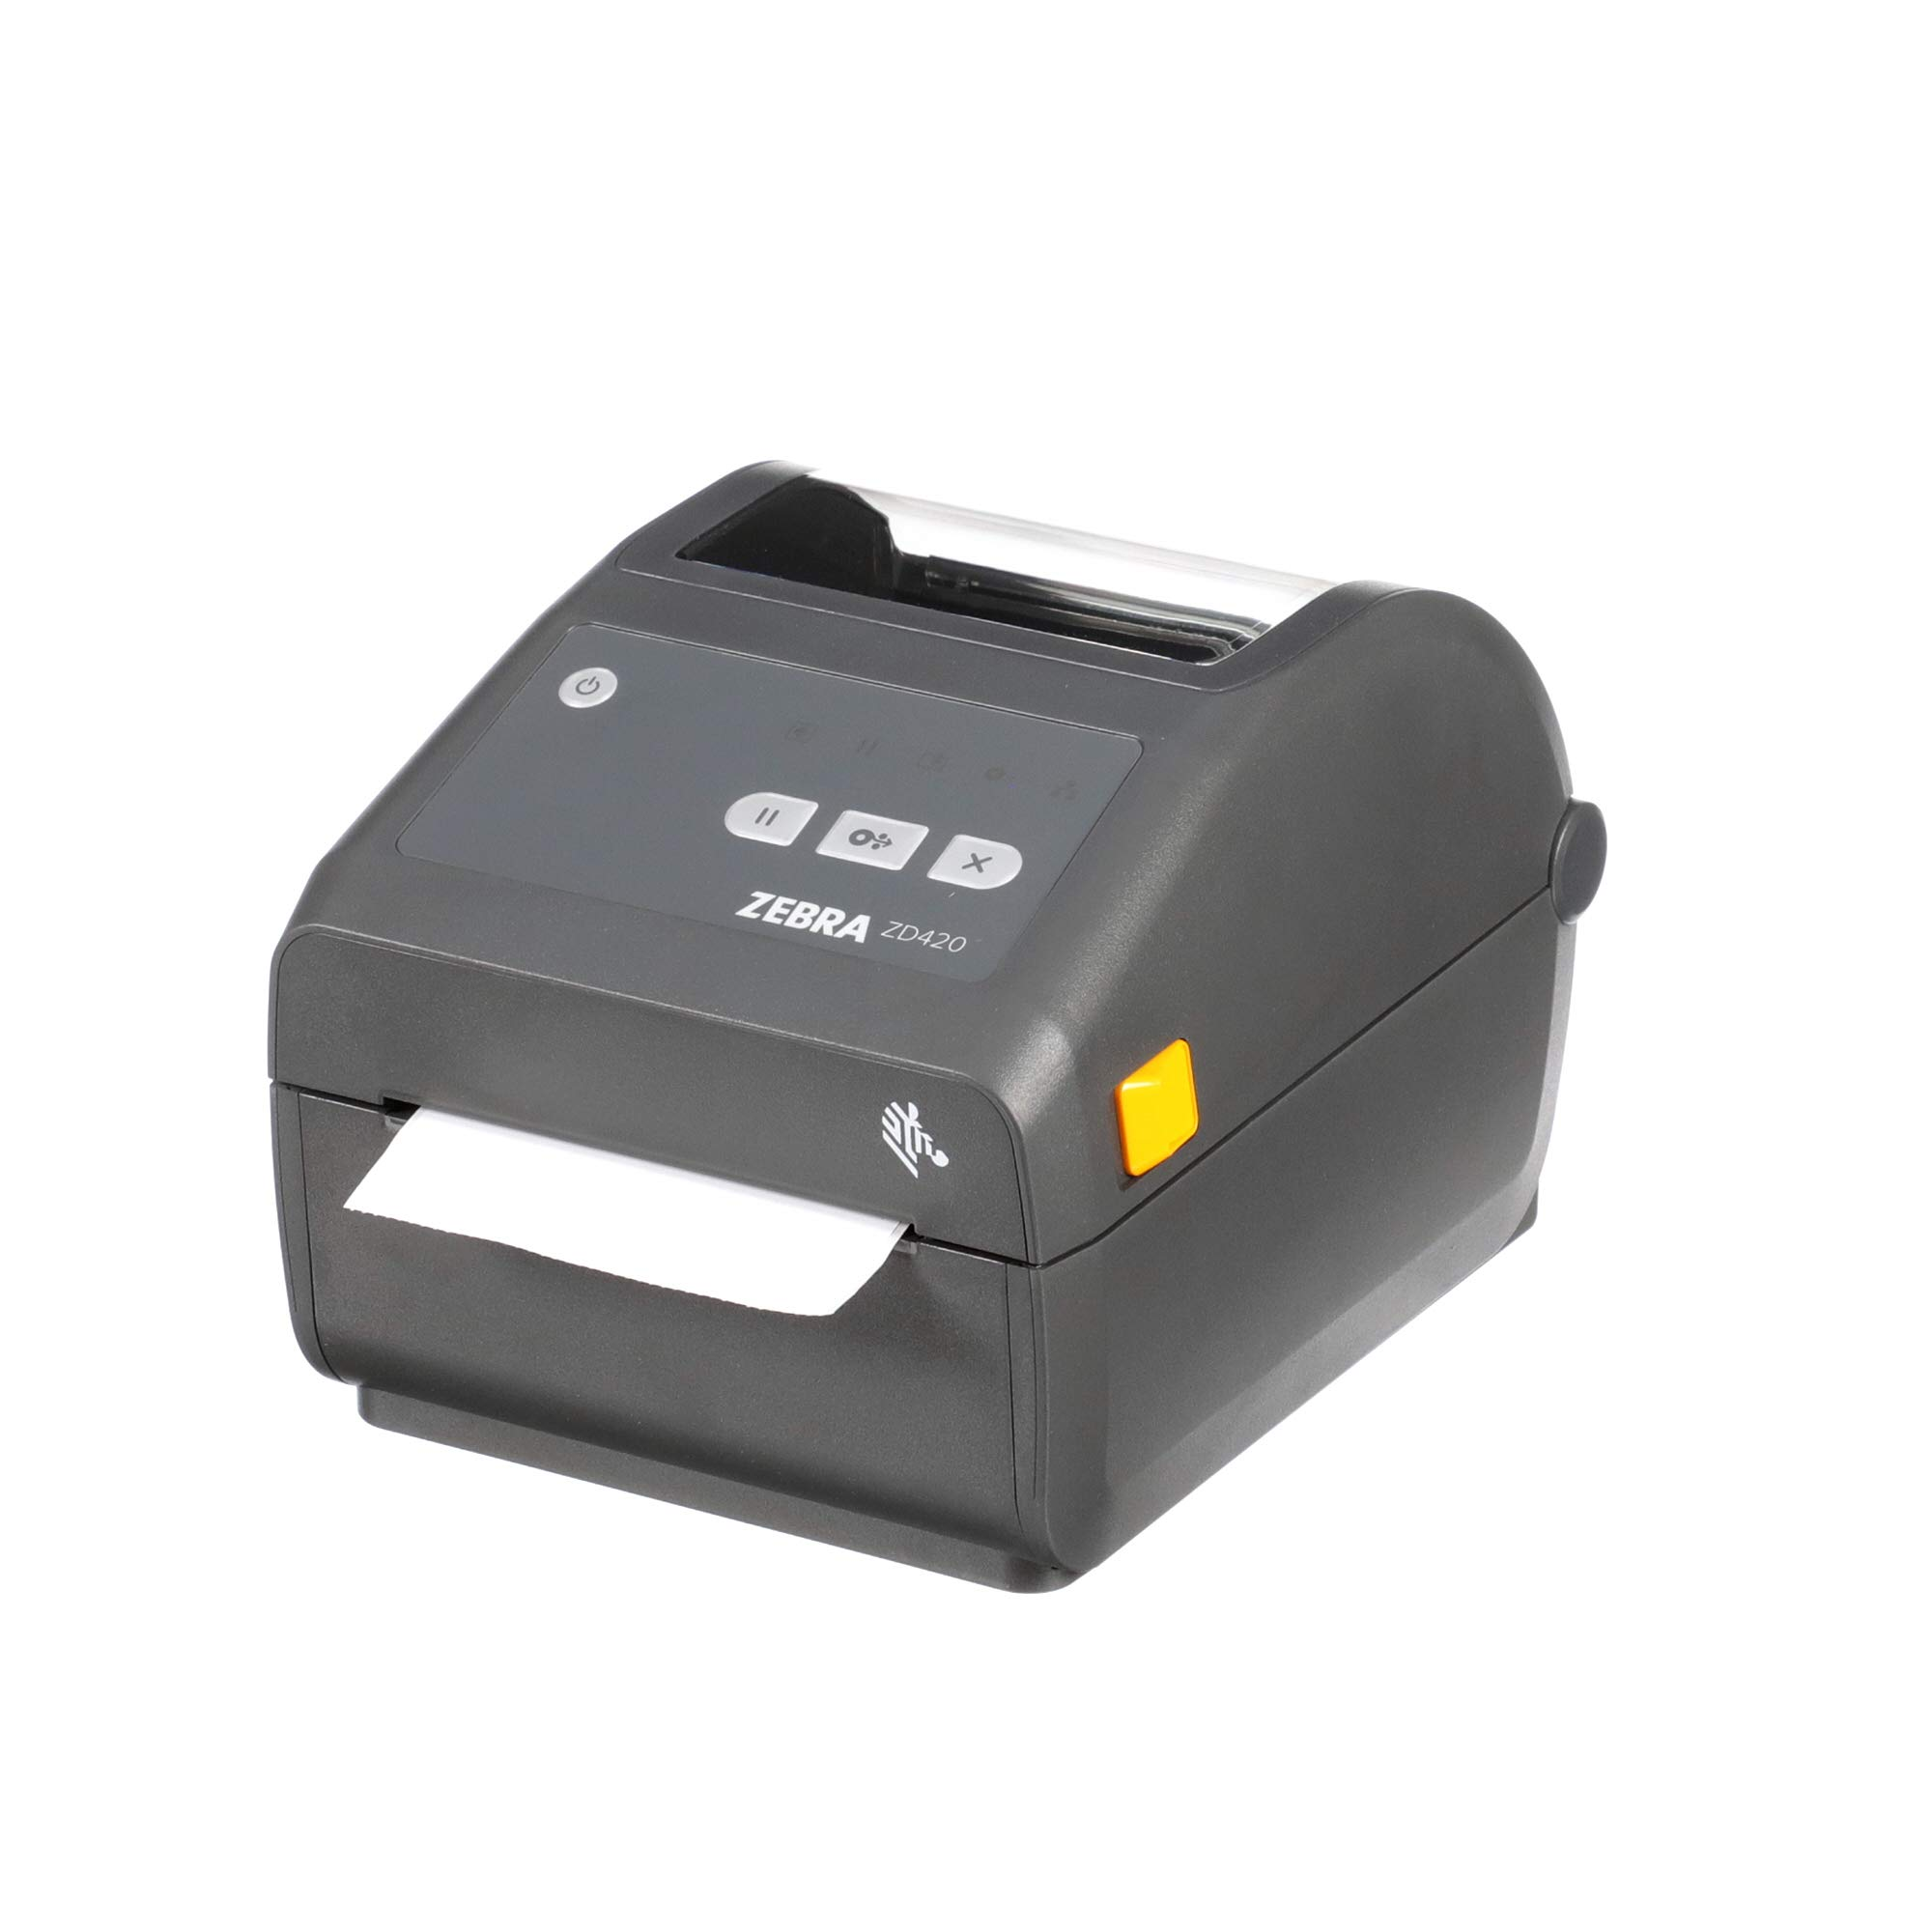 Zebra - ZD420d Direct Thermal Desktop Printer for Labels and Barcodes - Print Width 4 in - 203 dpi - Interface: USB - ZD42042-D01000EZ by ZEBRA